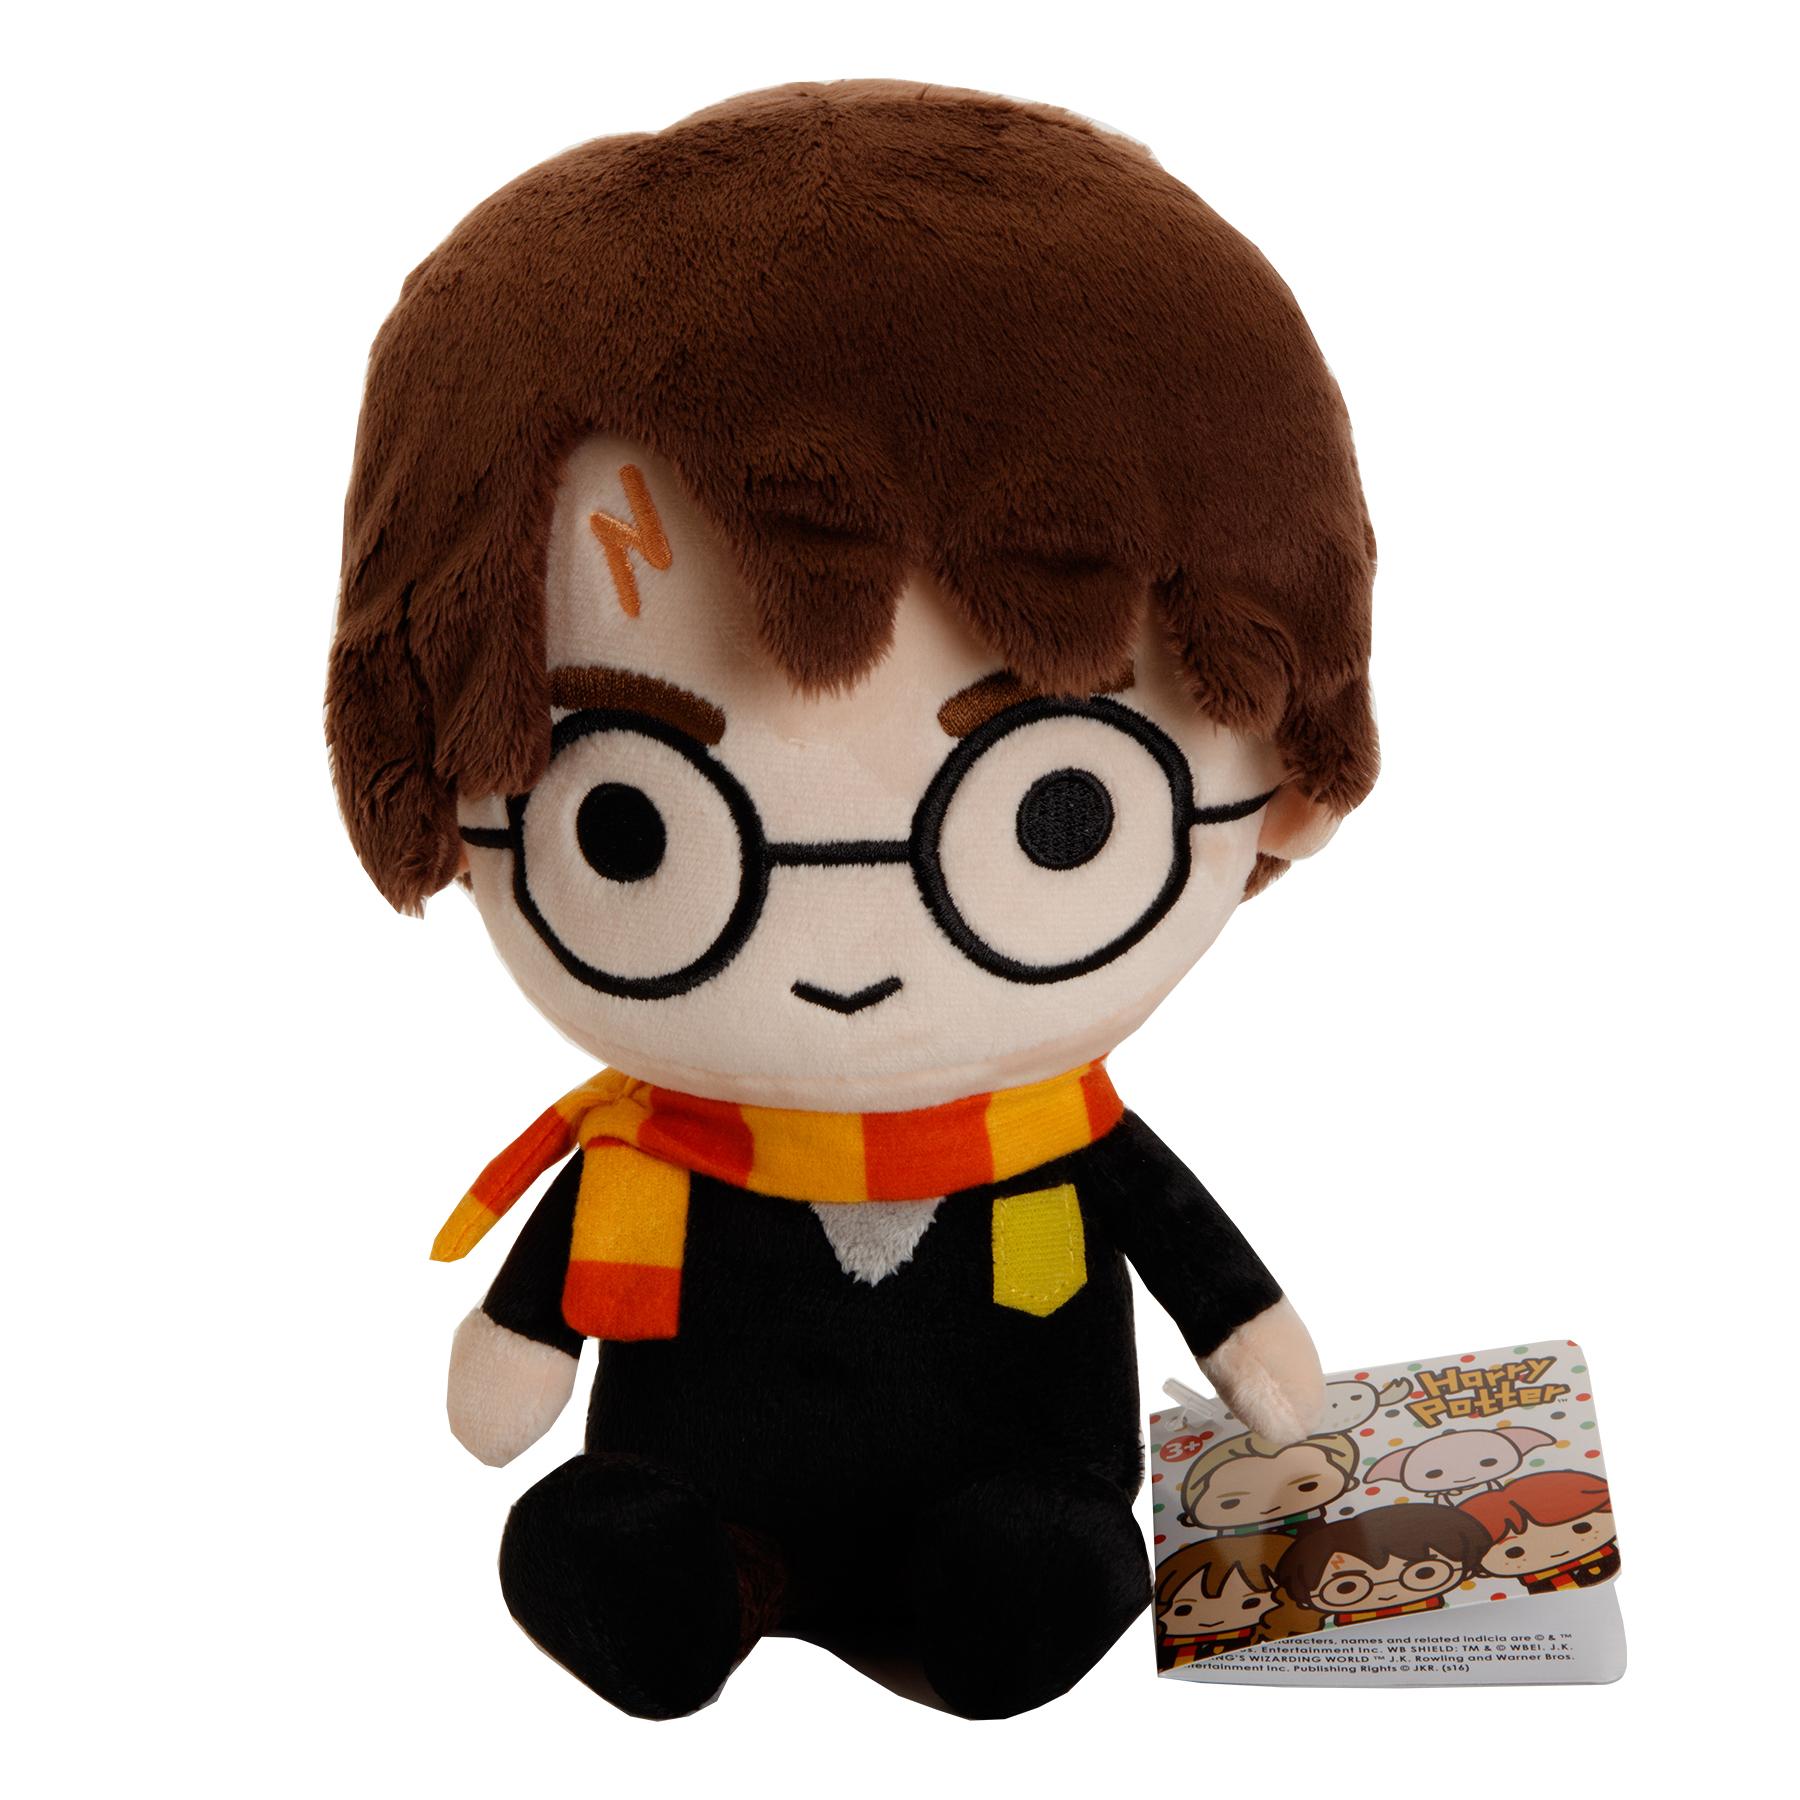 Harry Toys 7